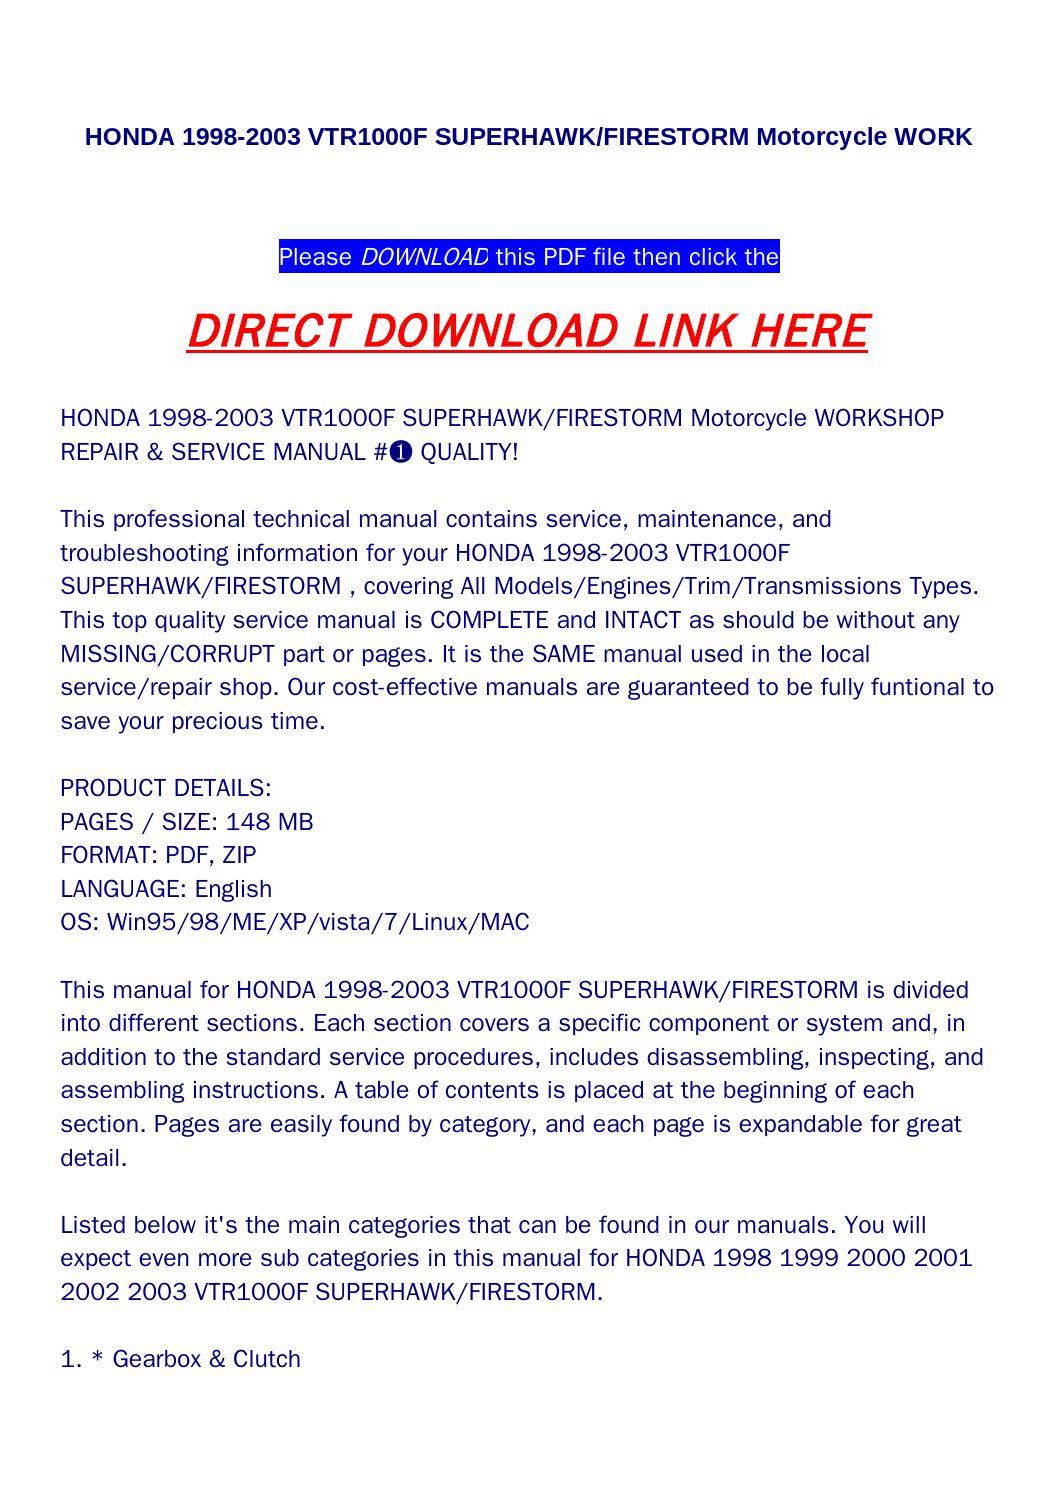 Honda 1998 2003 vtr1000f superhawk firestorm motorcycle work by bonus300 -  issuu